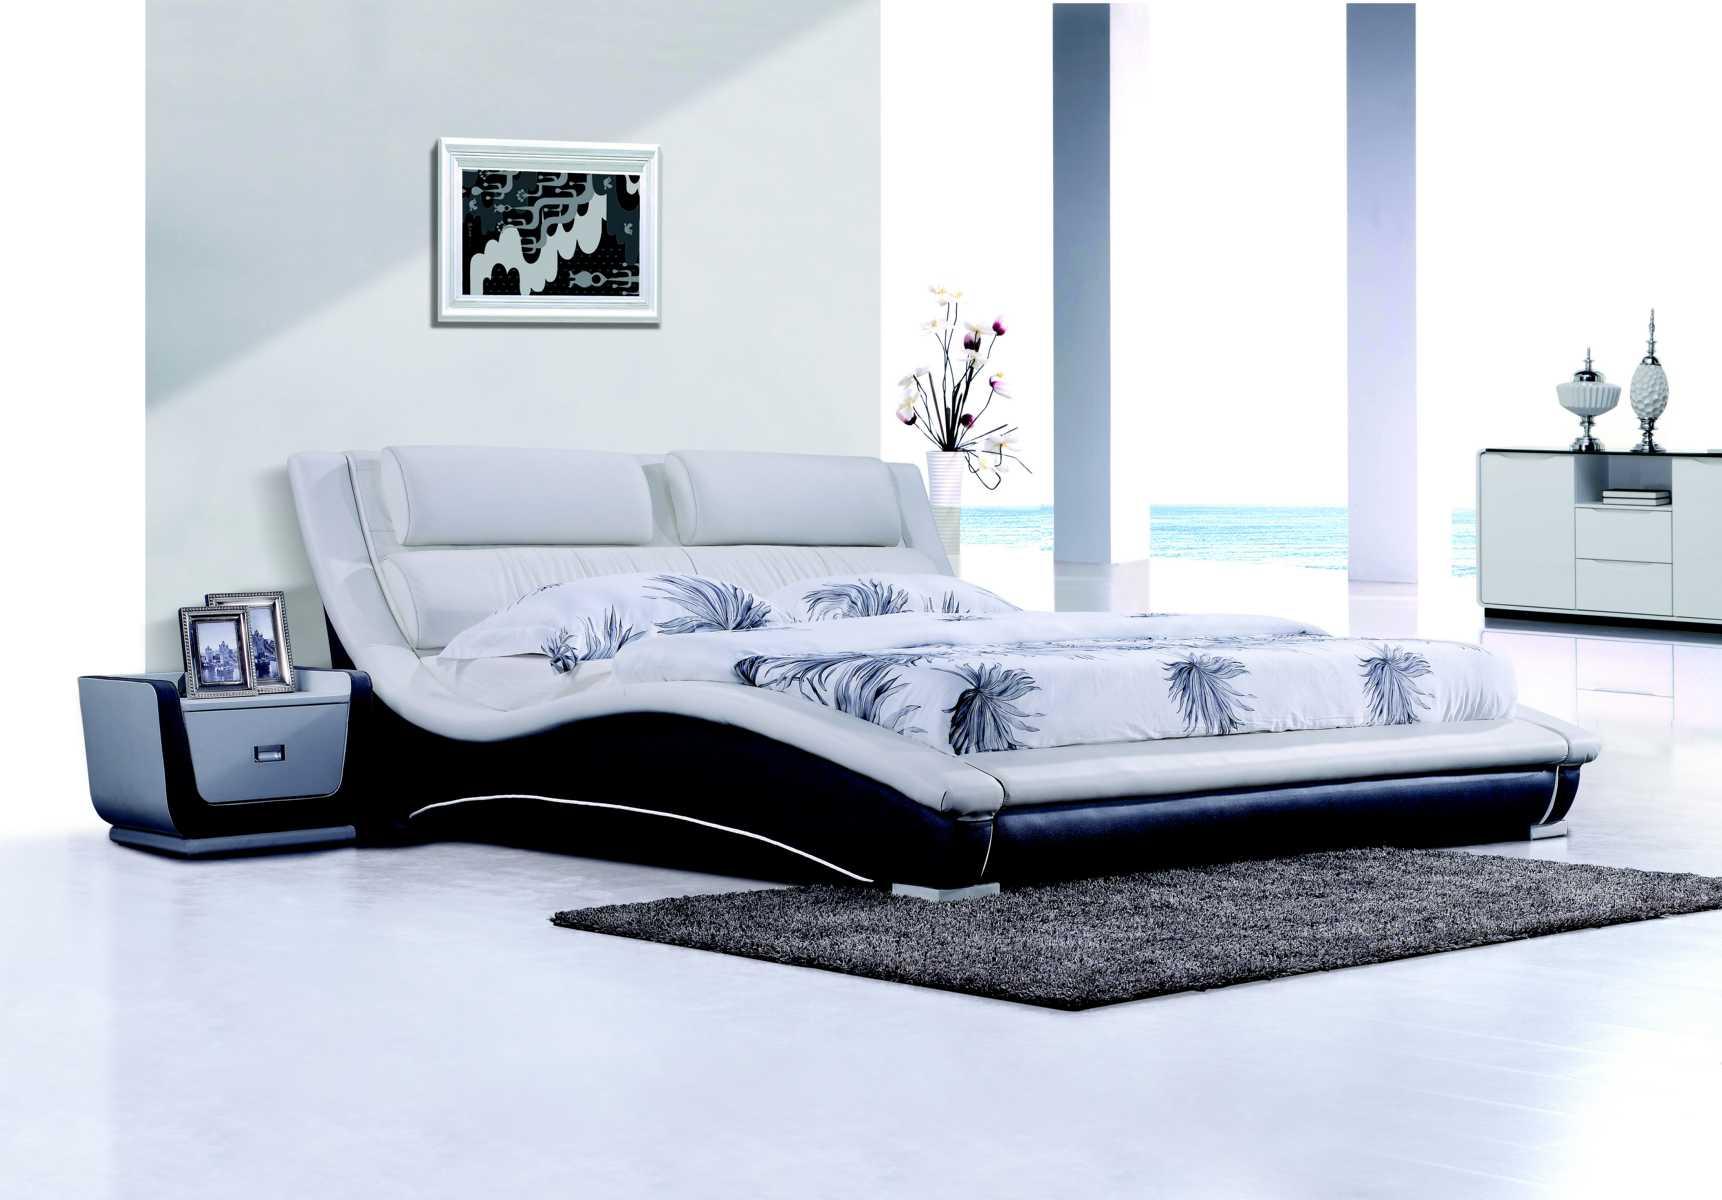 design betten in hochwertiger qualit t oder rundbett wt4794 bei jv m bel. Black Bedroom Furniture Sets. Home Design Ideas